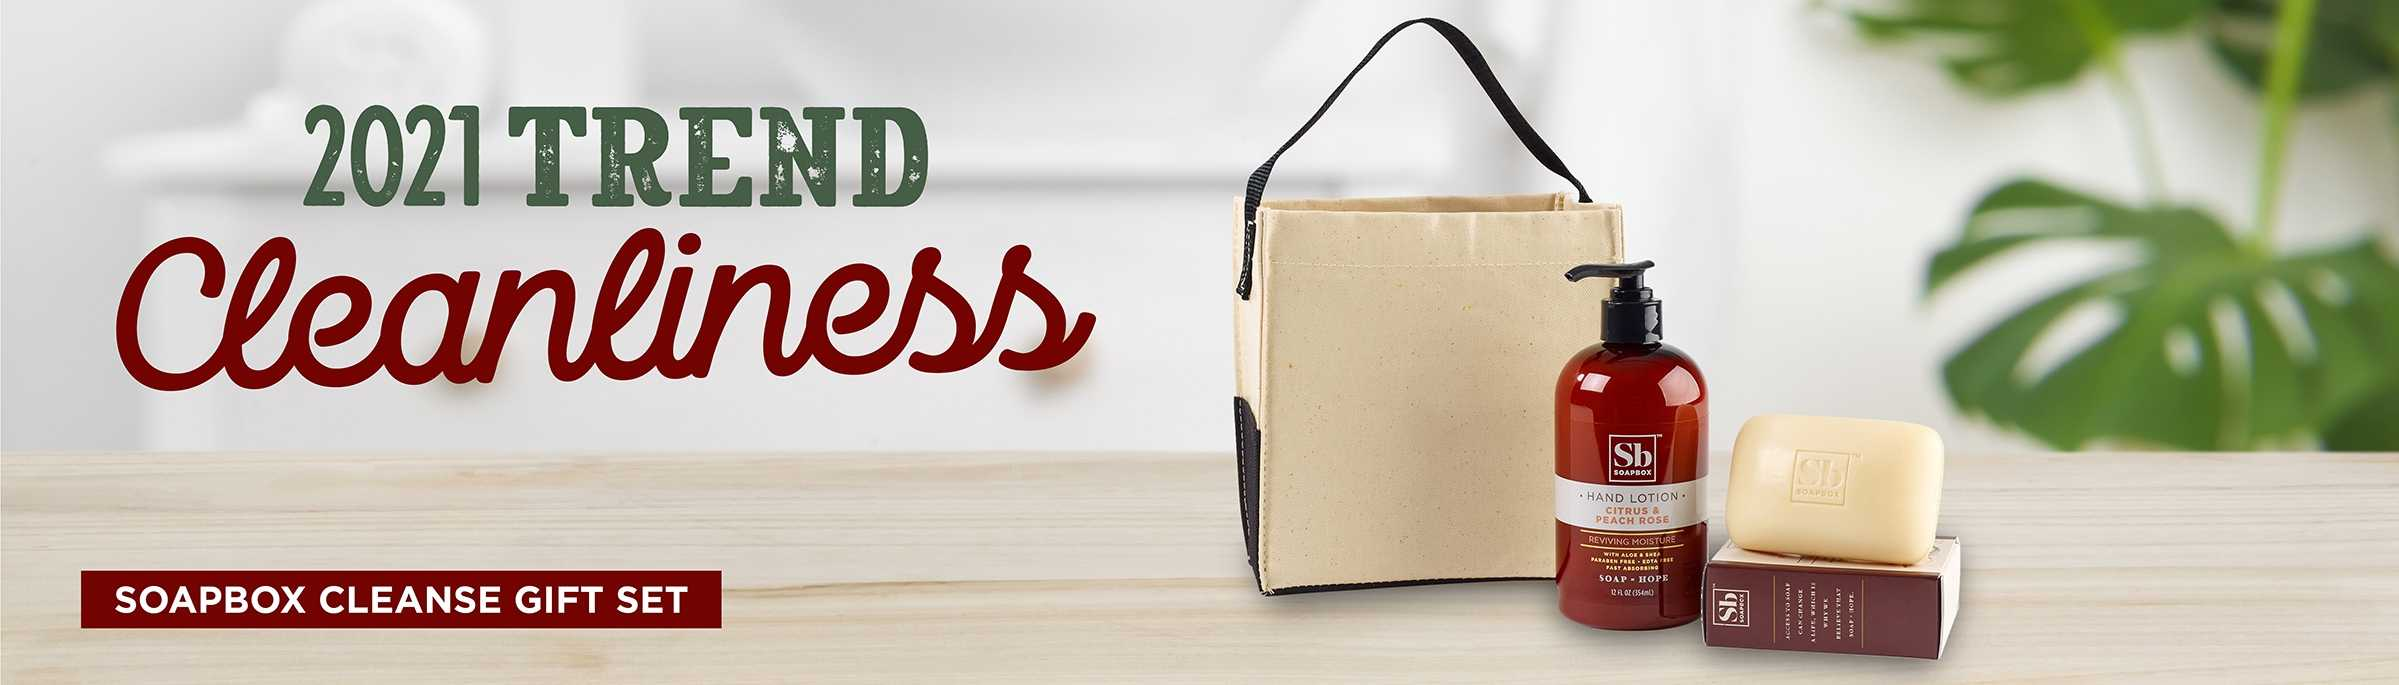 Soapbox Cleanse Gift Set AIM